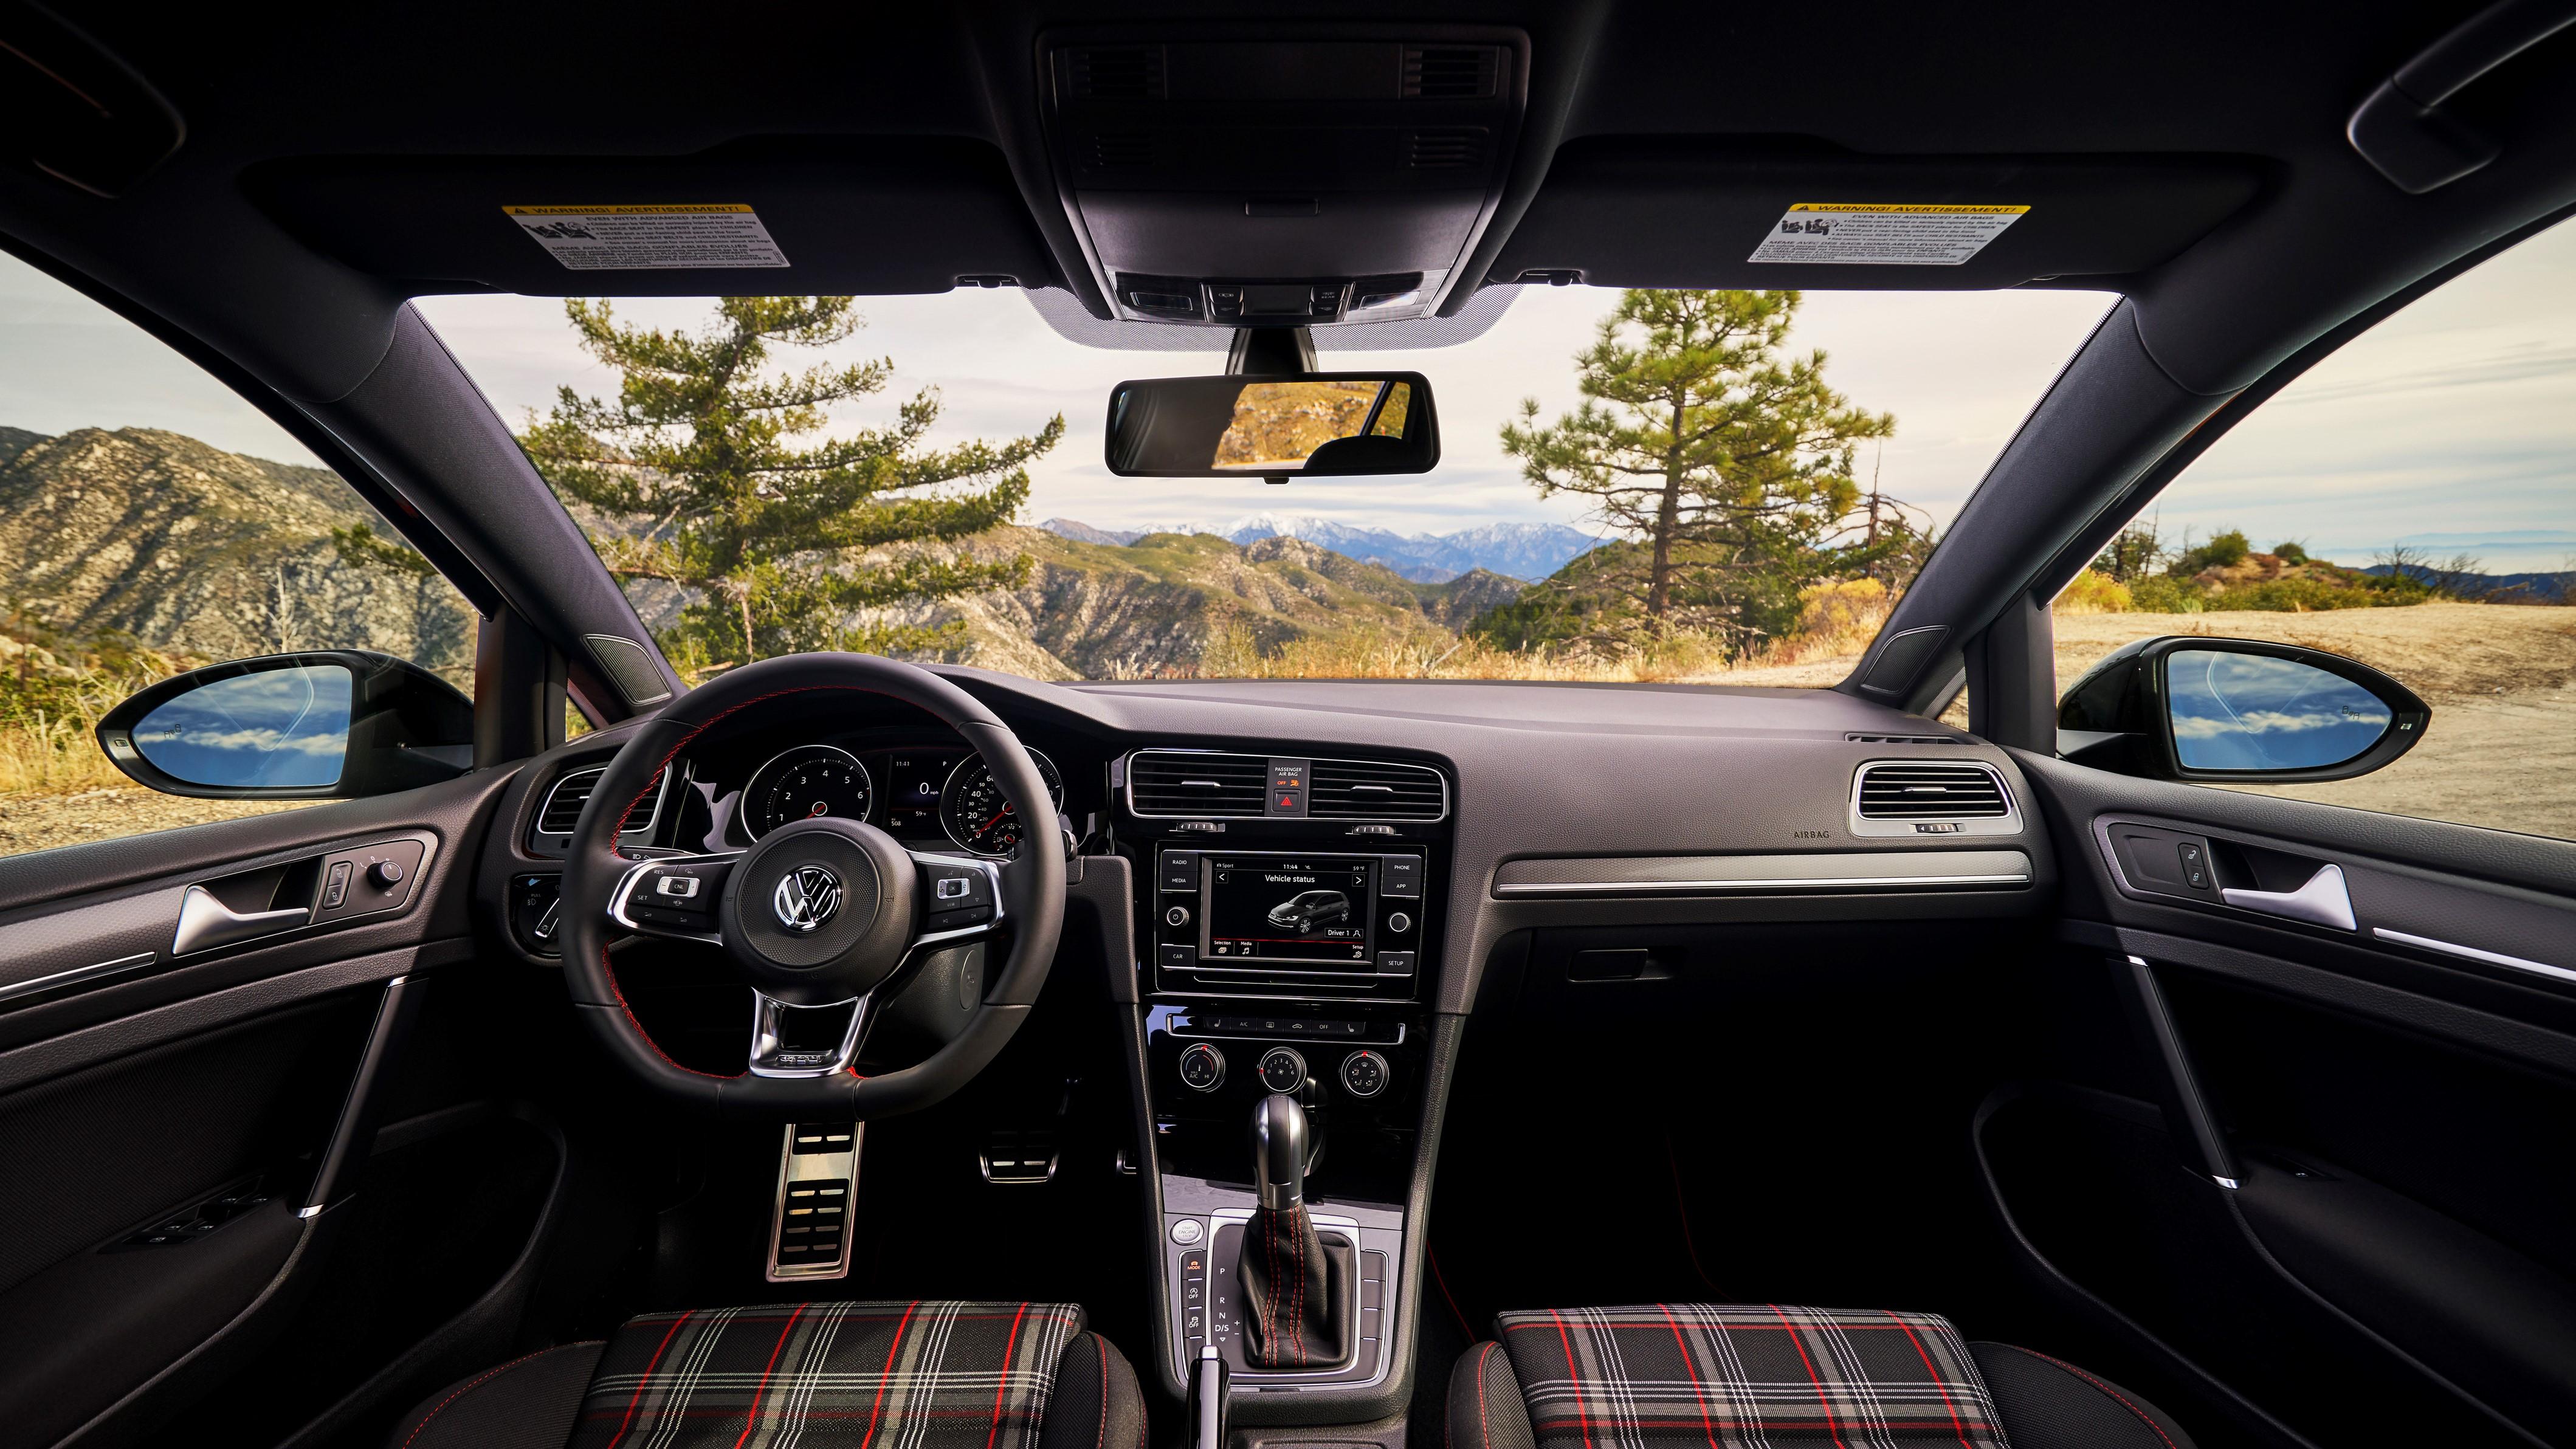 VW Golf GTI 2.0T Autobahn